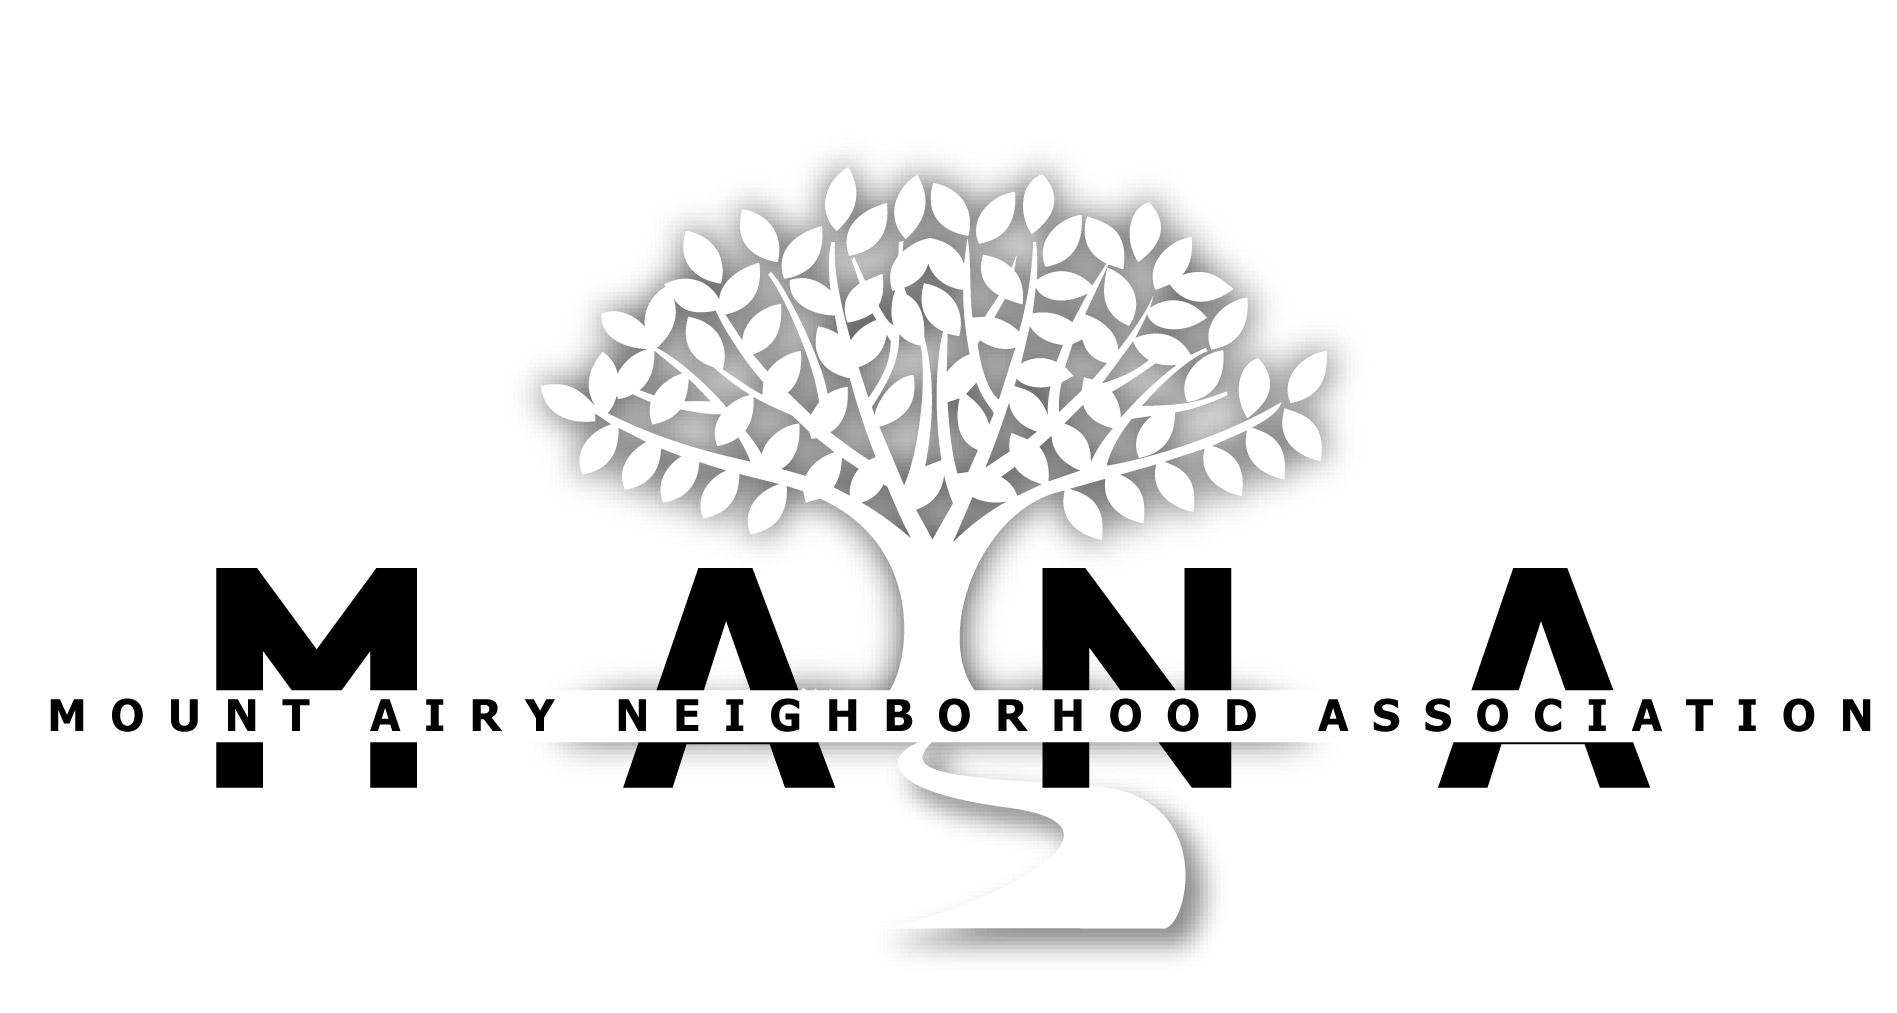 Mount Airy Neighborhood Association